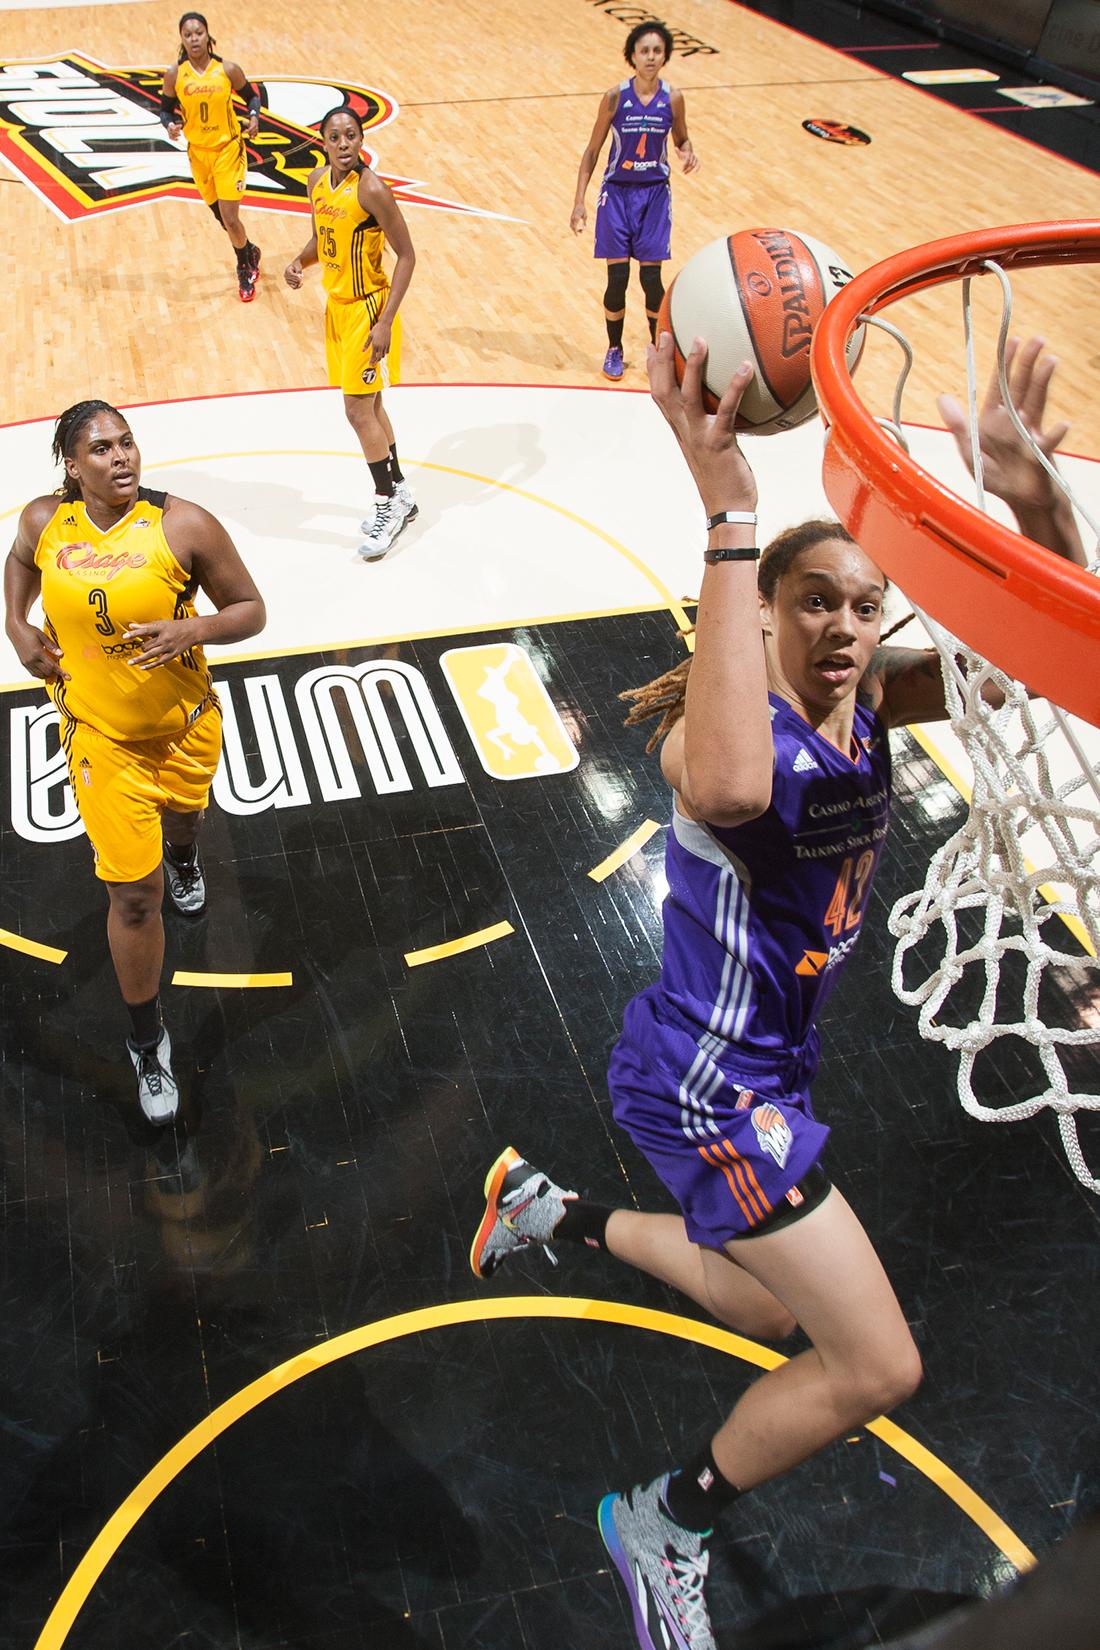 Brittney Griner en viva basquet